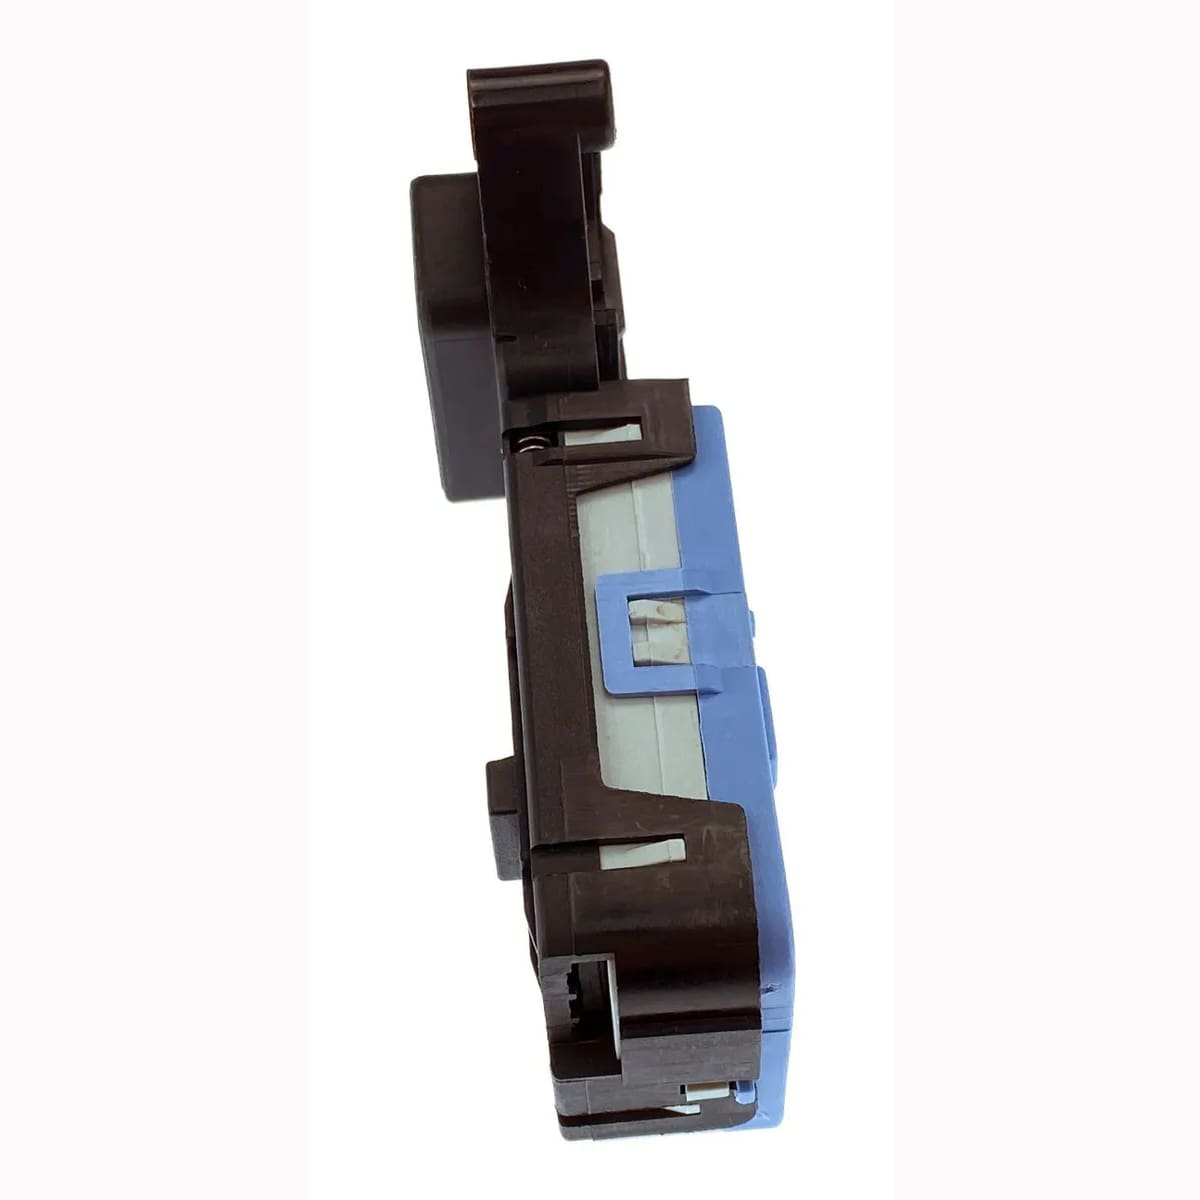 Trava Porta Electrolux Lava Seca Lsi09 Lse09 110v - 3619047210 / A07650201